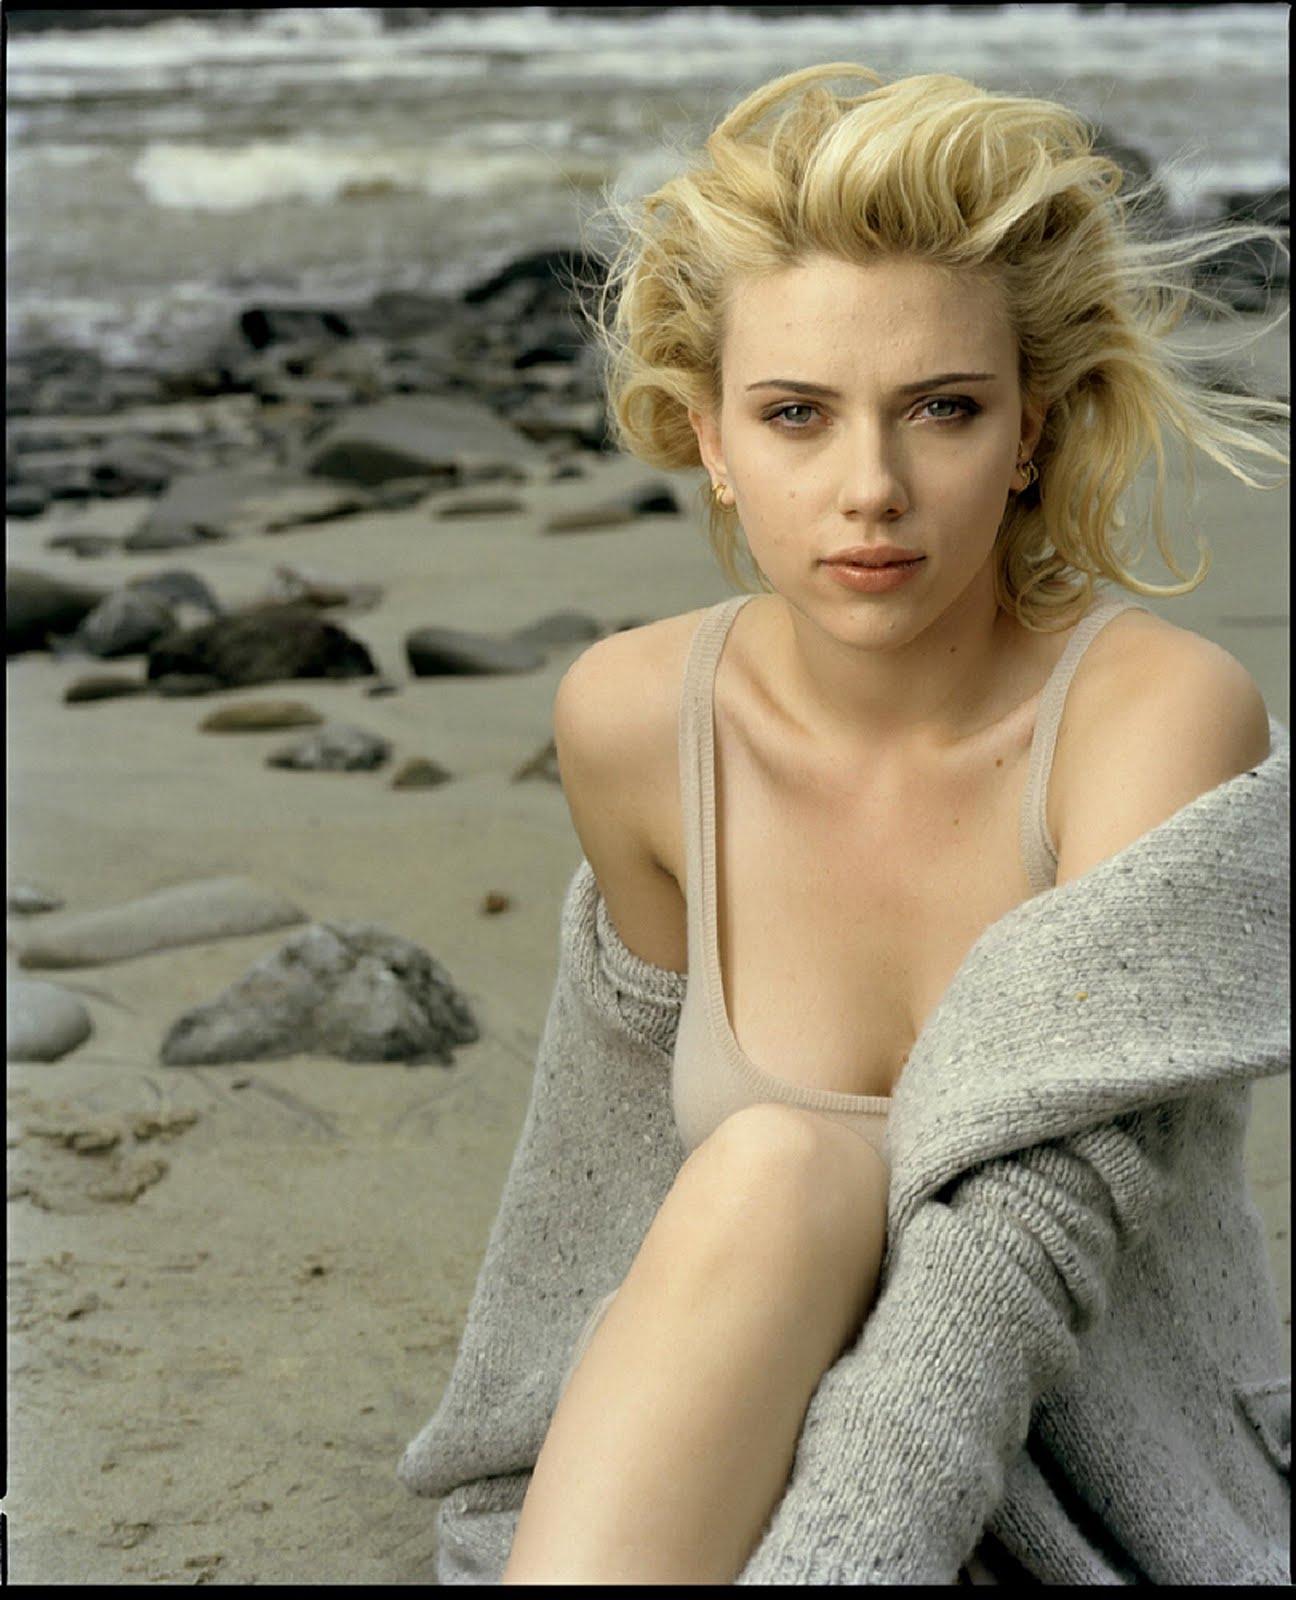 http://3.bp.blogspot.com/_cyH_7sPxVcQ/TD3sWNO7RnI/AAAAAAAADW4/jcBZ-3Yf0XU/s1600/Scarlett+Johansson+in+Beautiful+Beach+Photoshoot+by+Annie+Leibovitz+(2).jpg